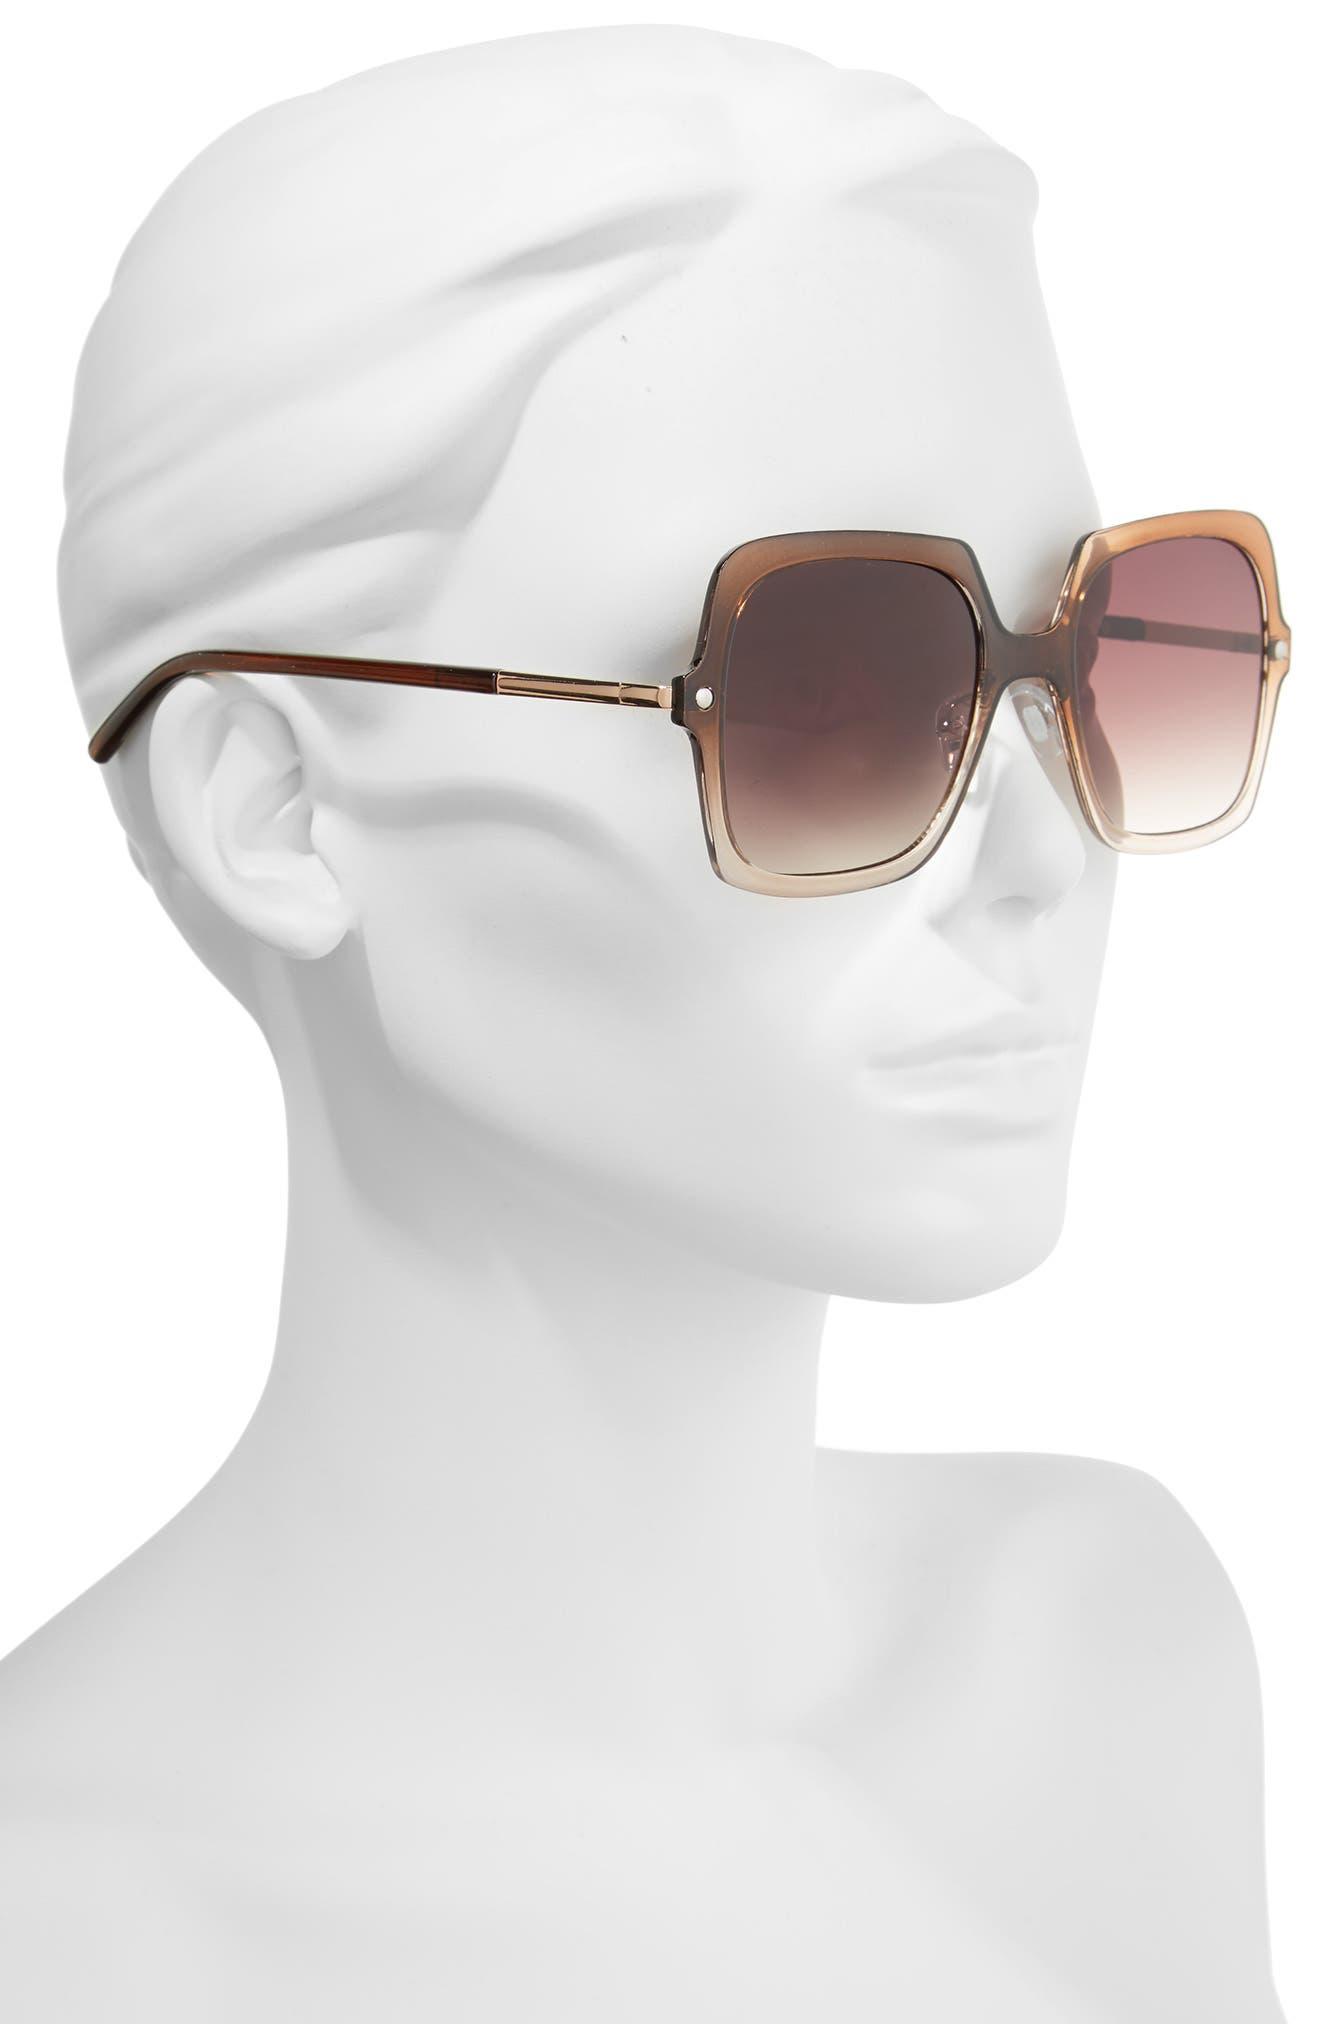 Translucent Square Sunglasses,                             Alternate thumbnail 2, color,                             200